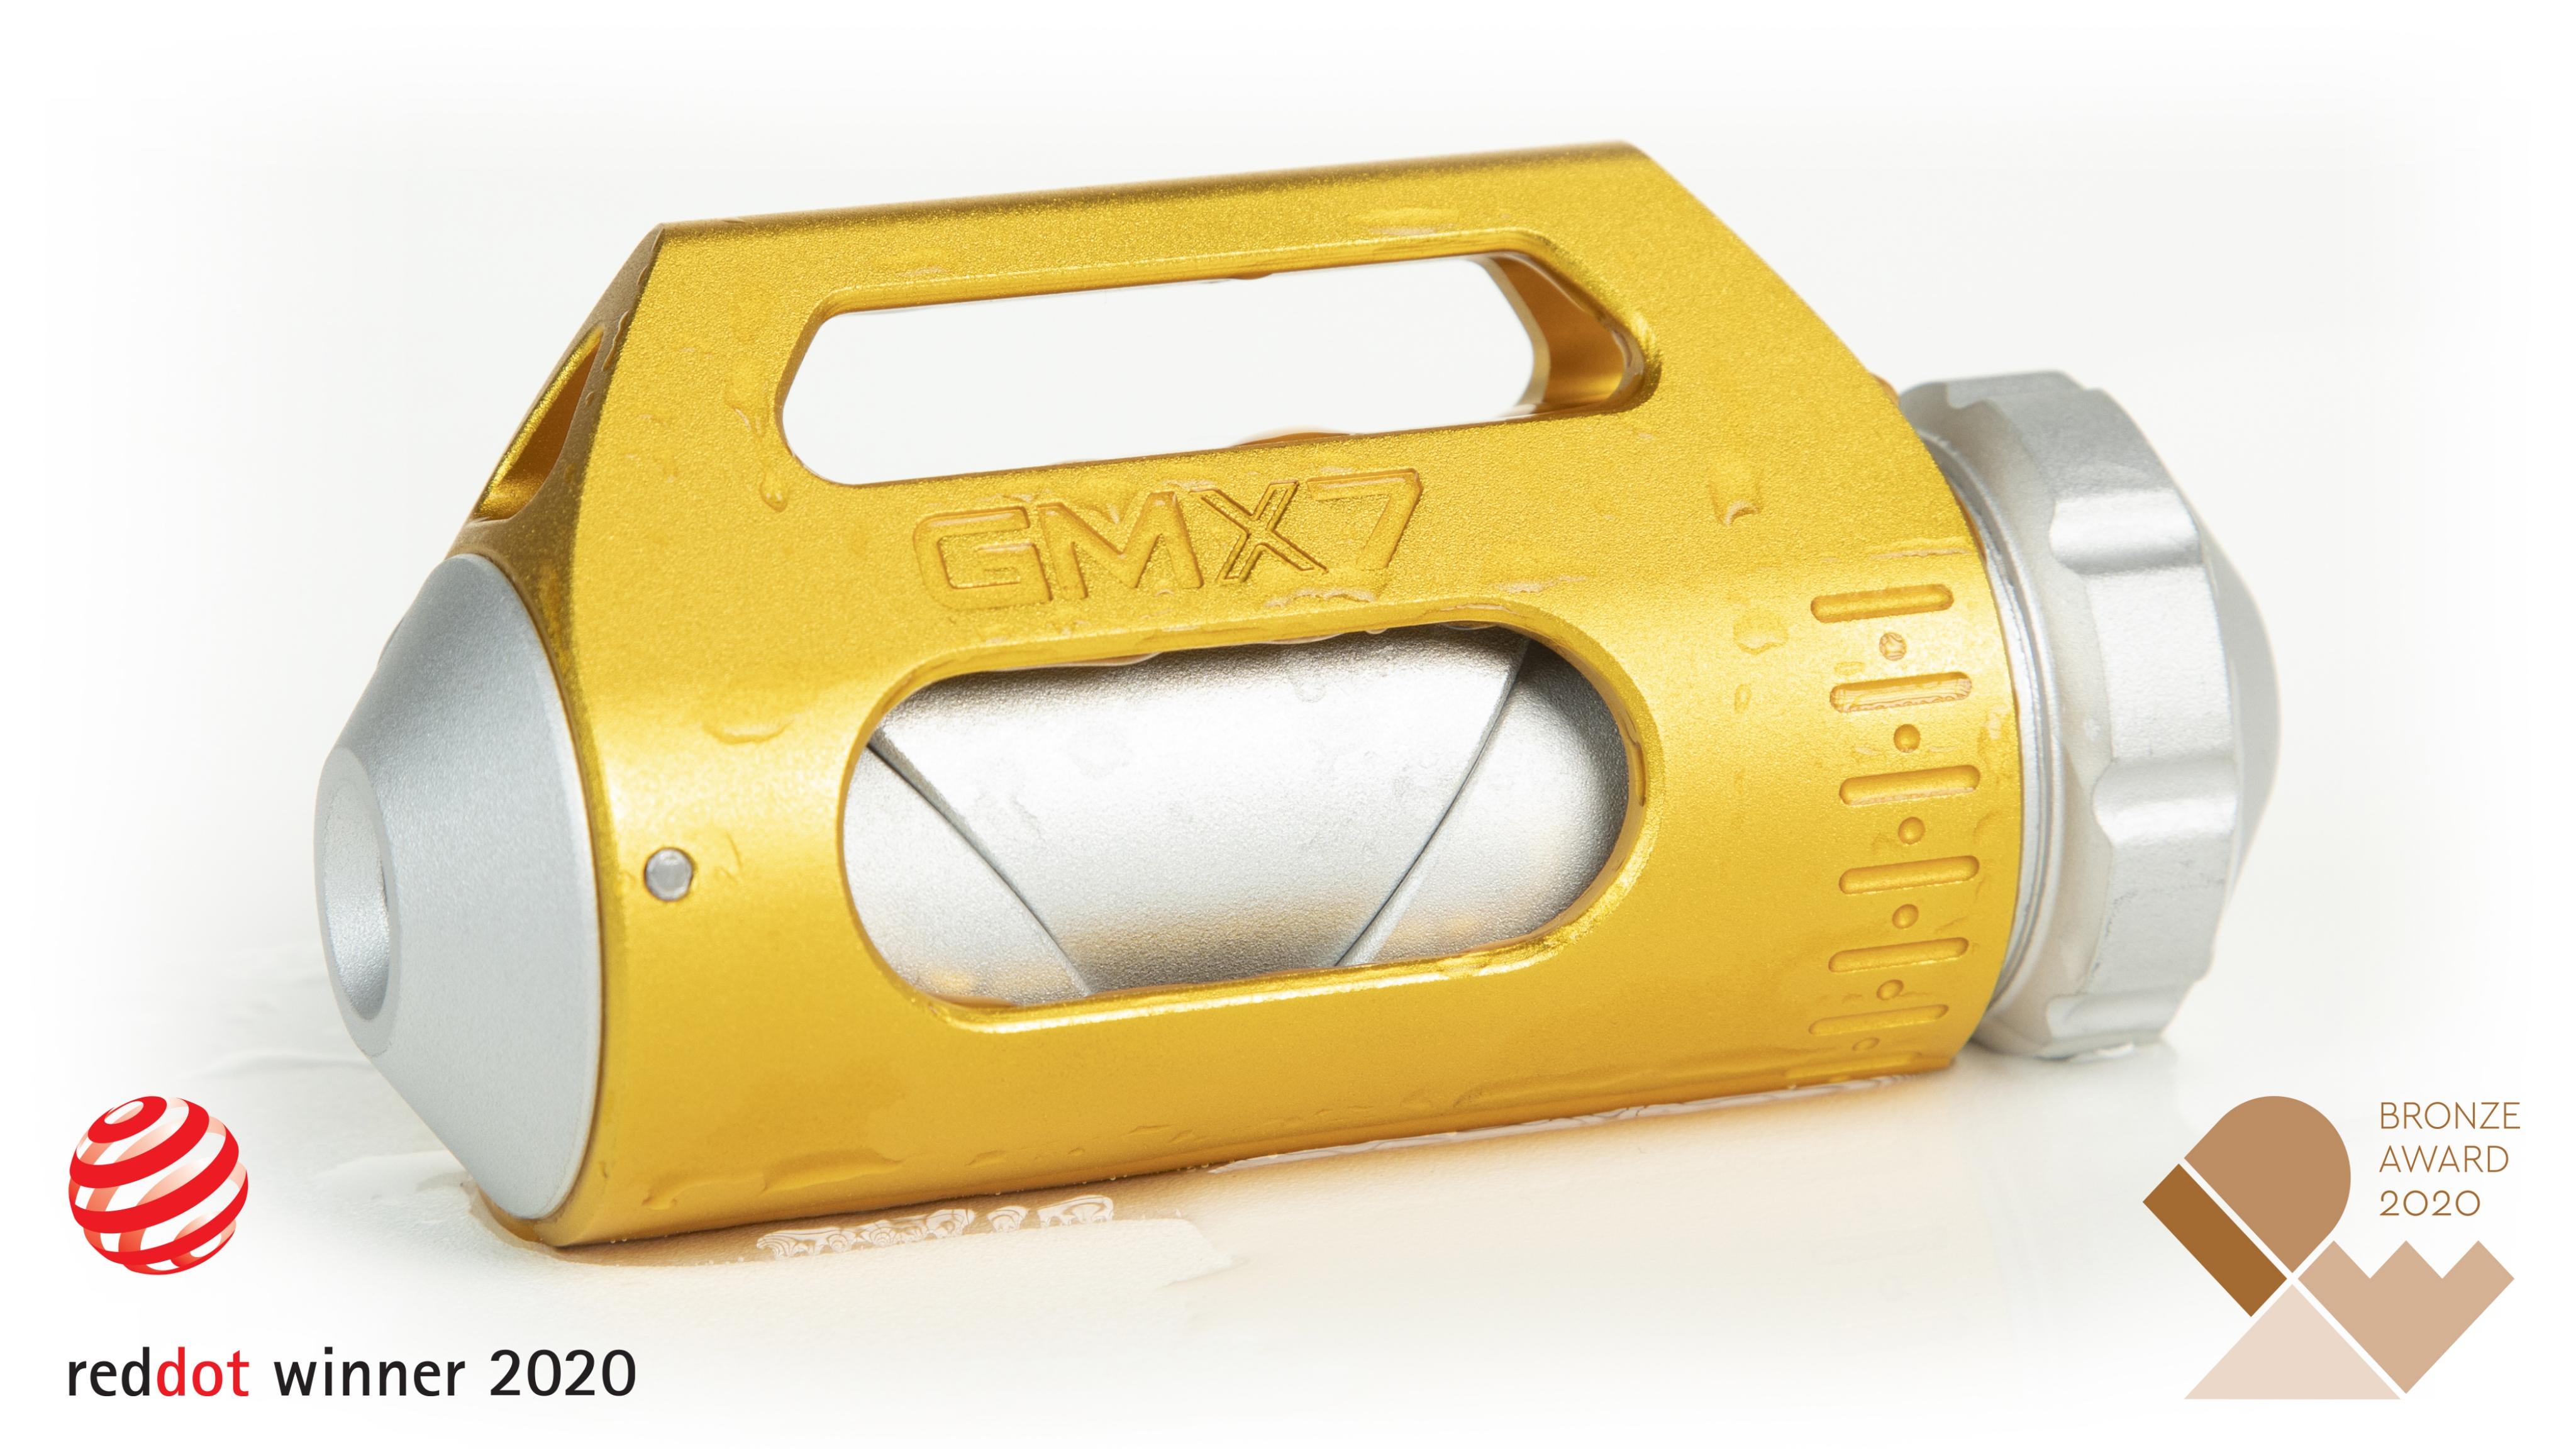 GMX7 X1-PRO Red Dot Winner 2020, IDEA 2020 Winner